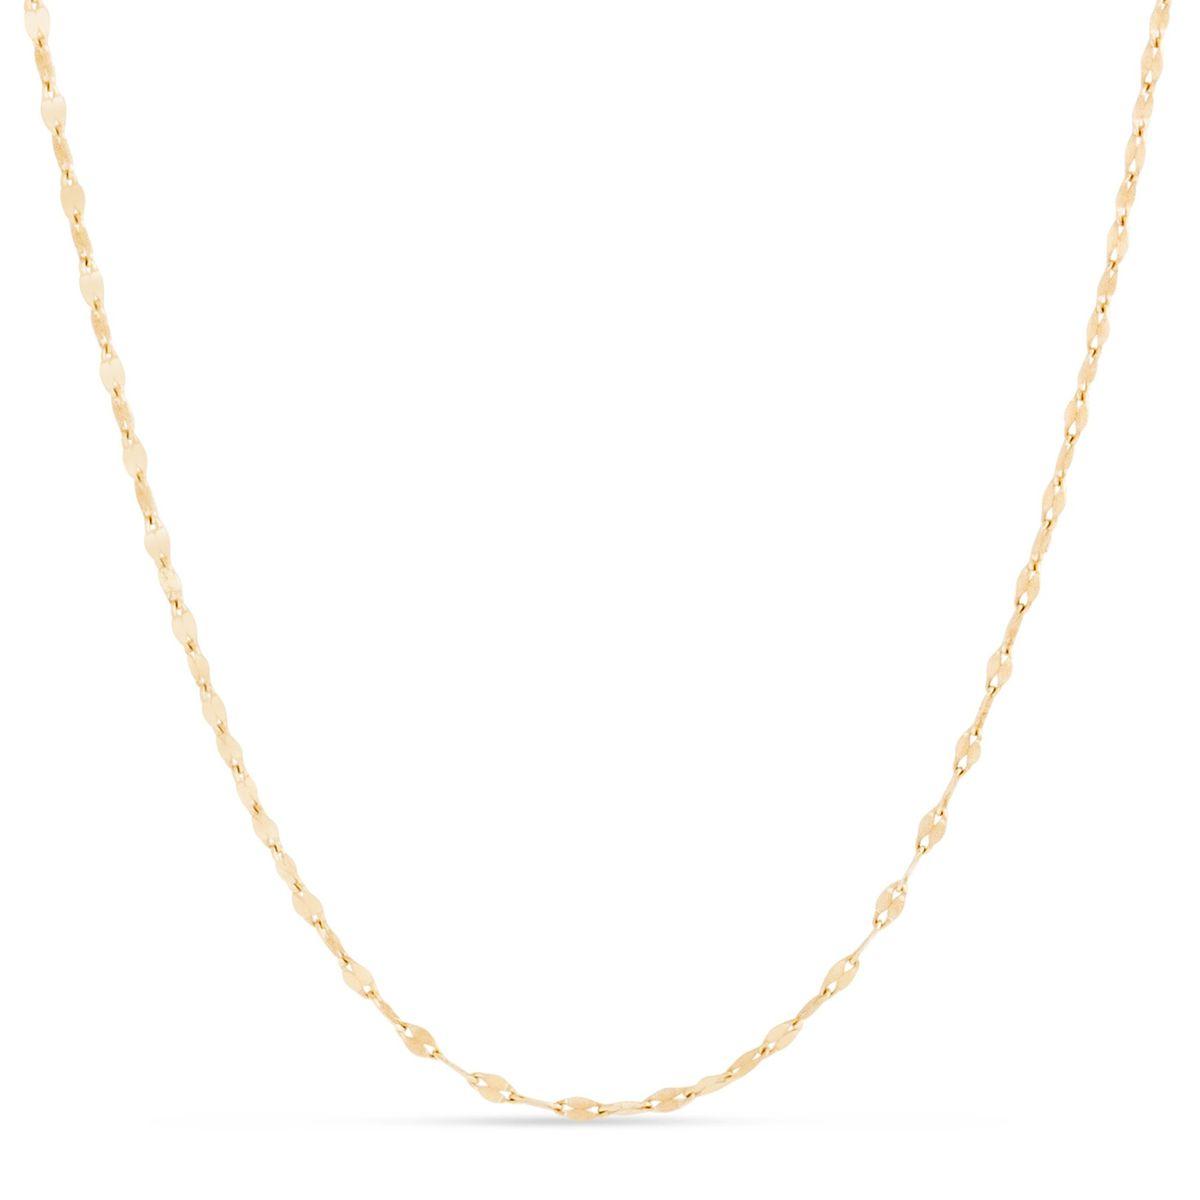 Best Fine Jewelry You Can Buy Online Mejuri Vrai Gldn The Strategist New York Magazine